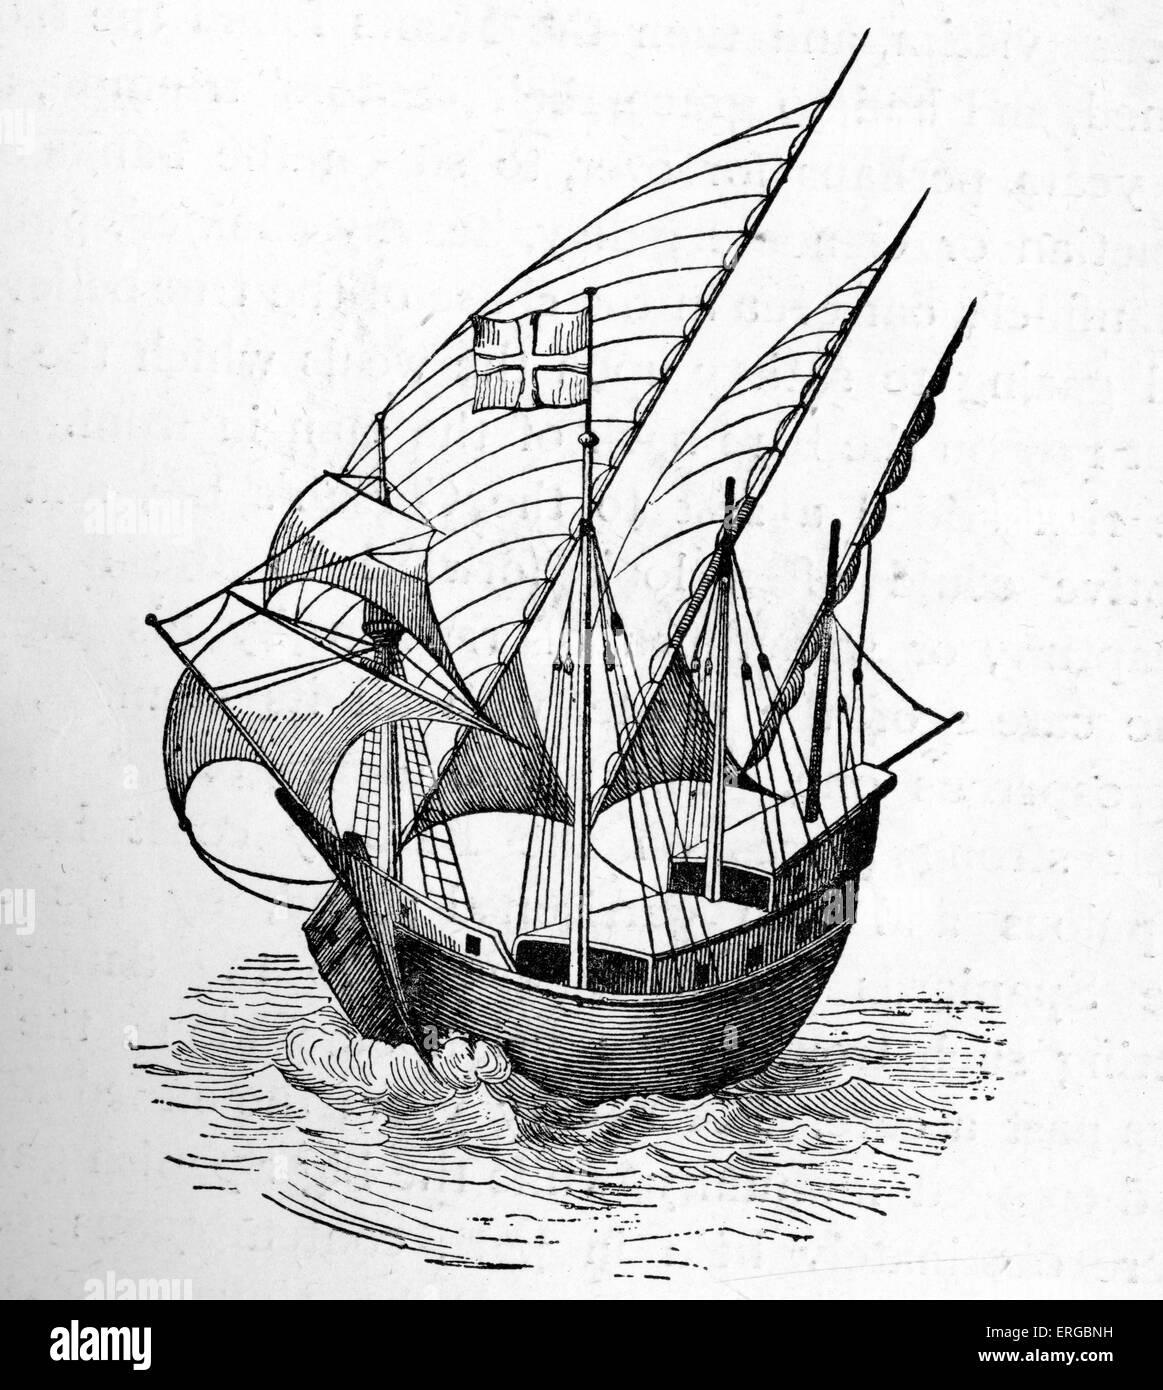 Caravel - 15th century. Ship used by pirates. (Jurien de la Graviere) - Stock Image